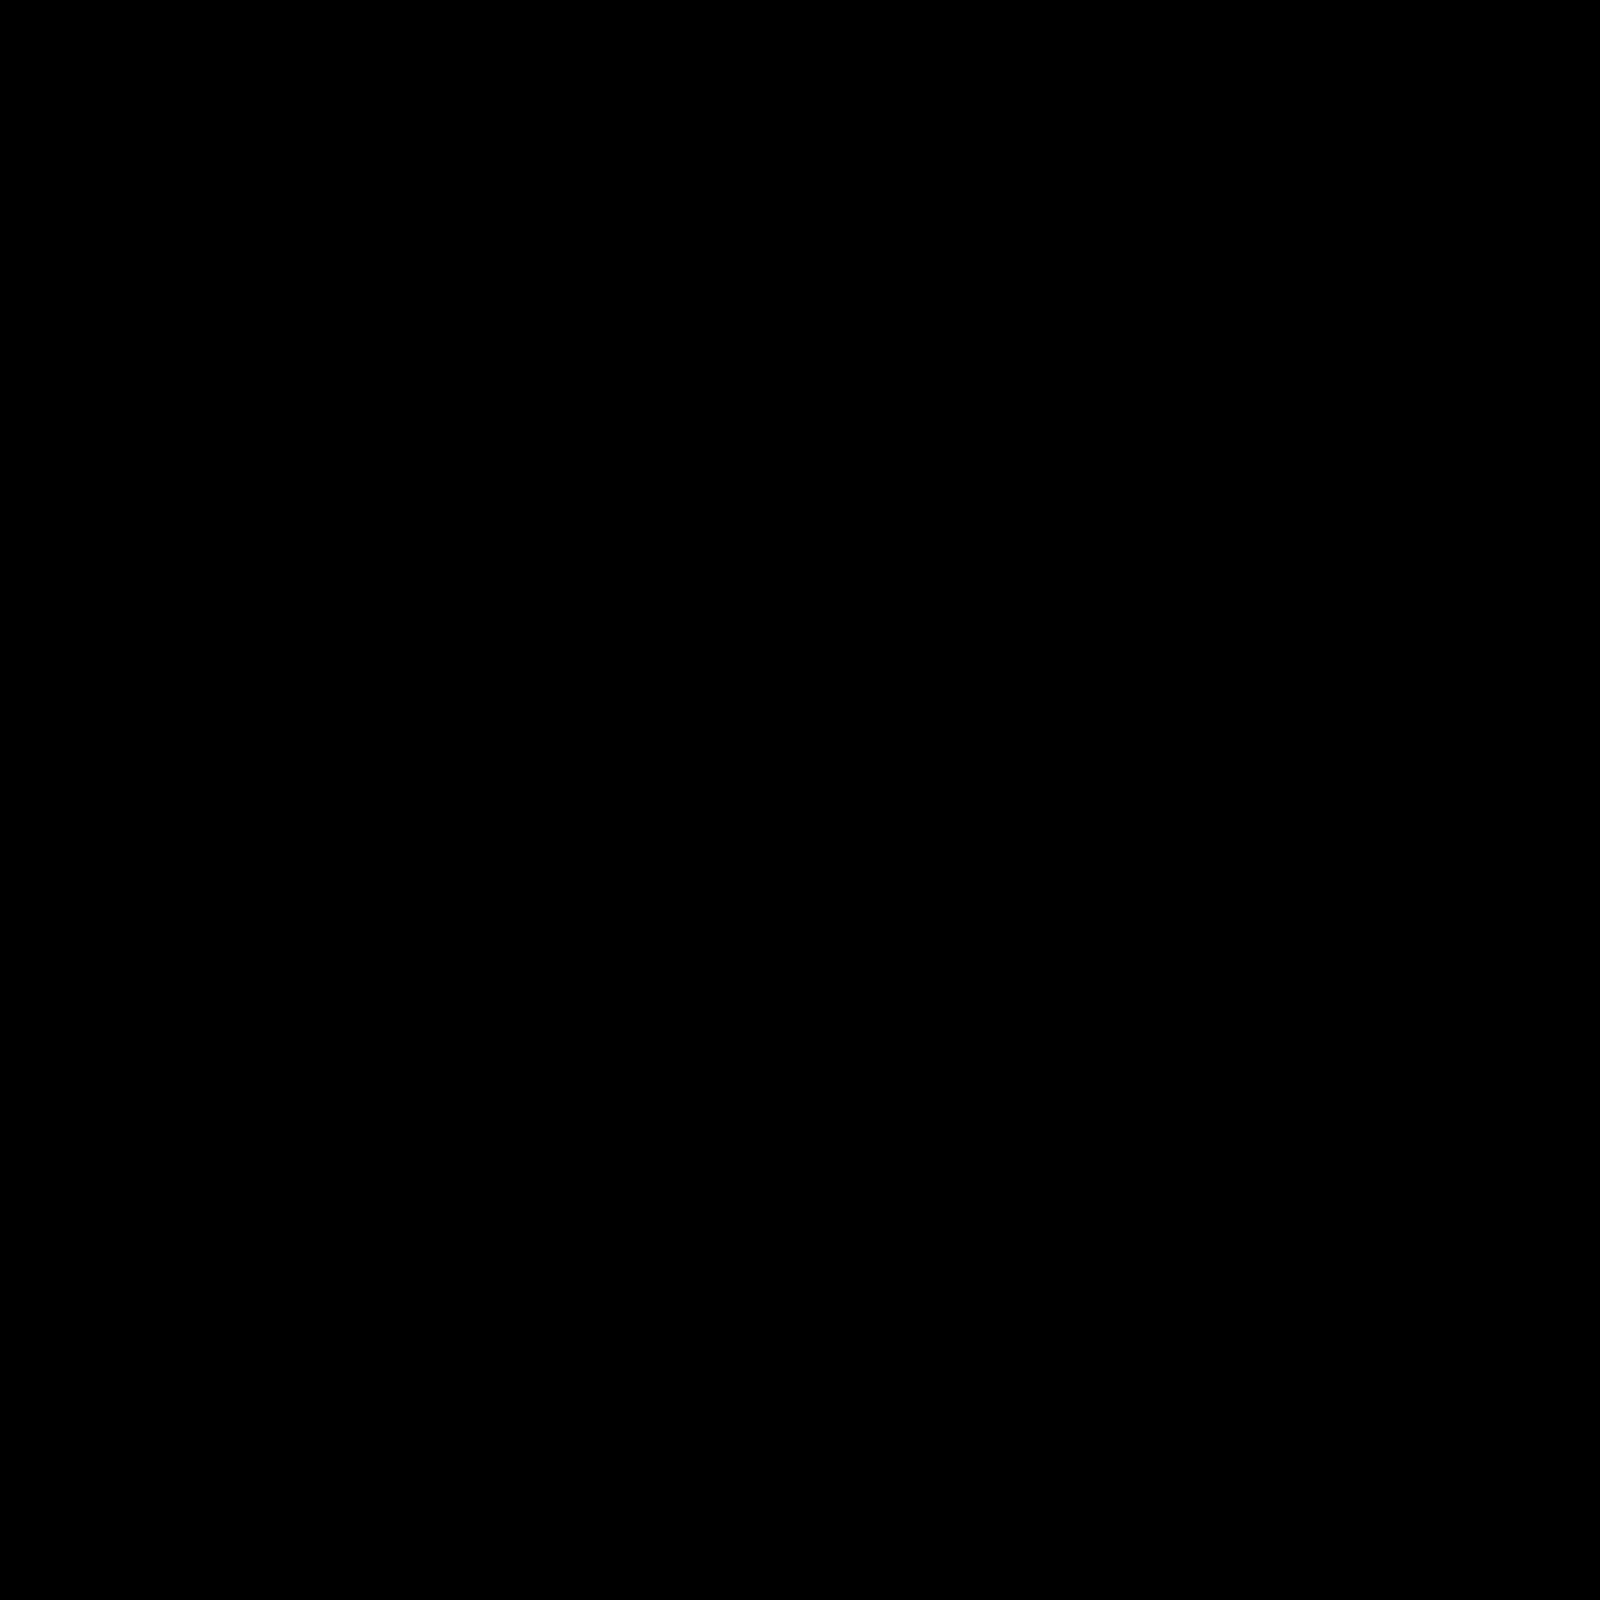 Odnoklassniki Circled Filled icon